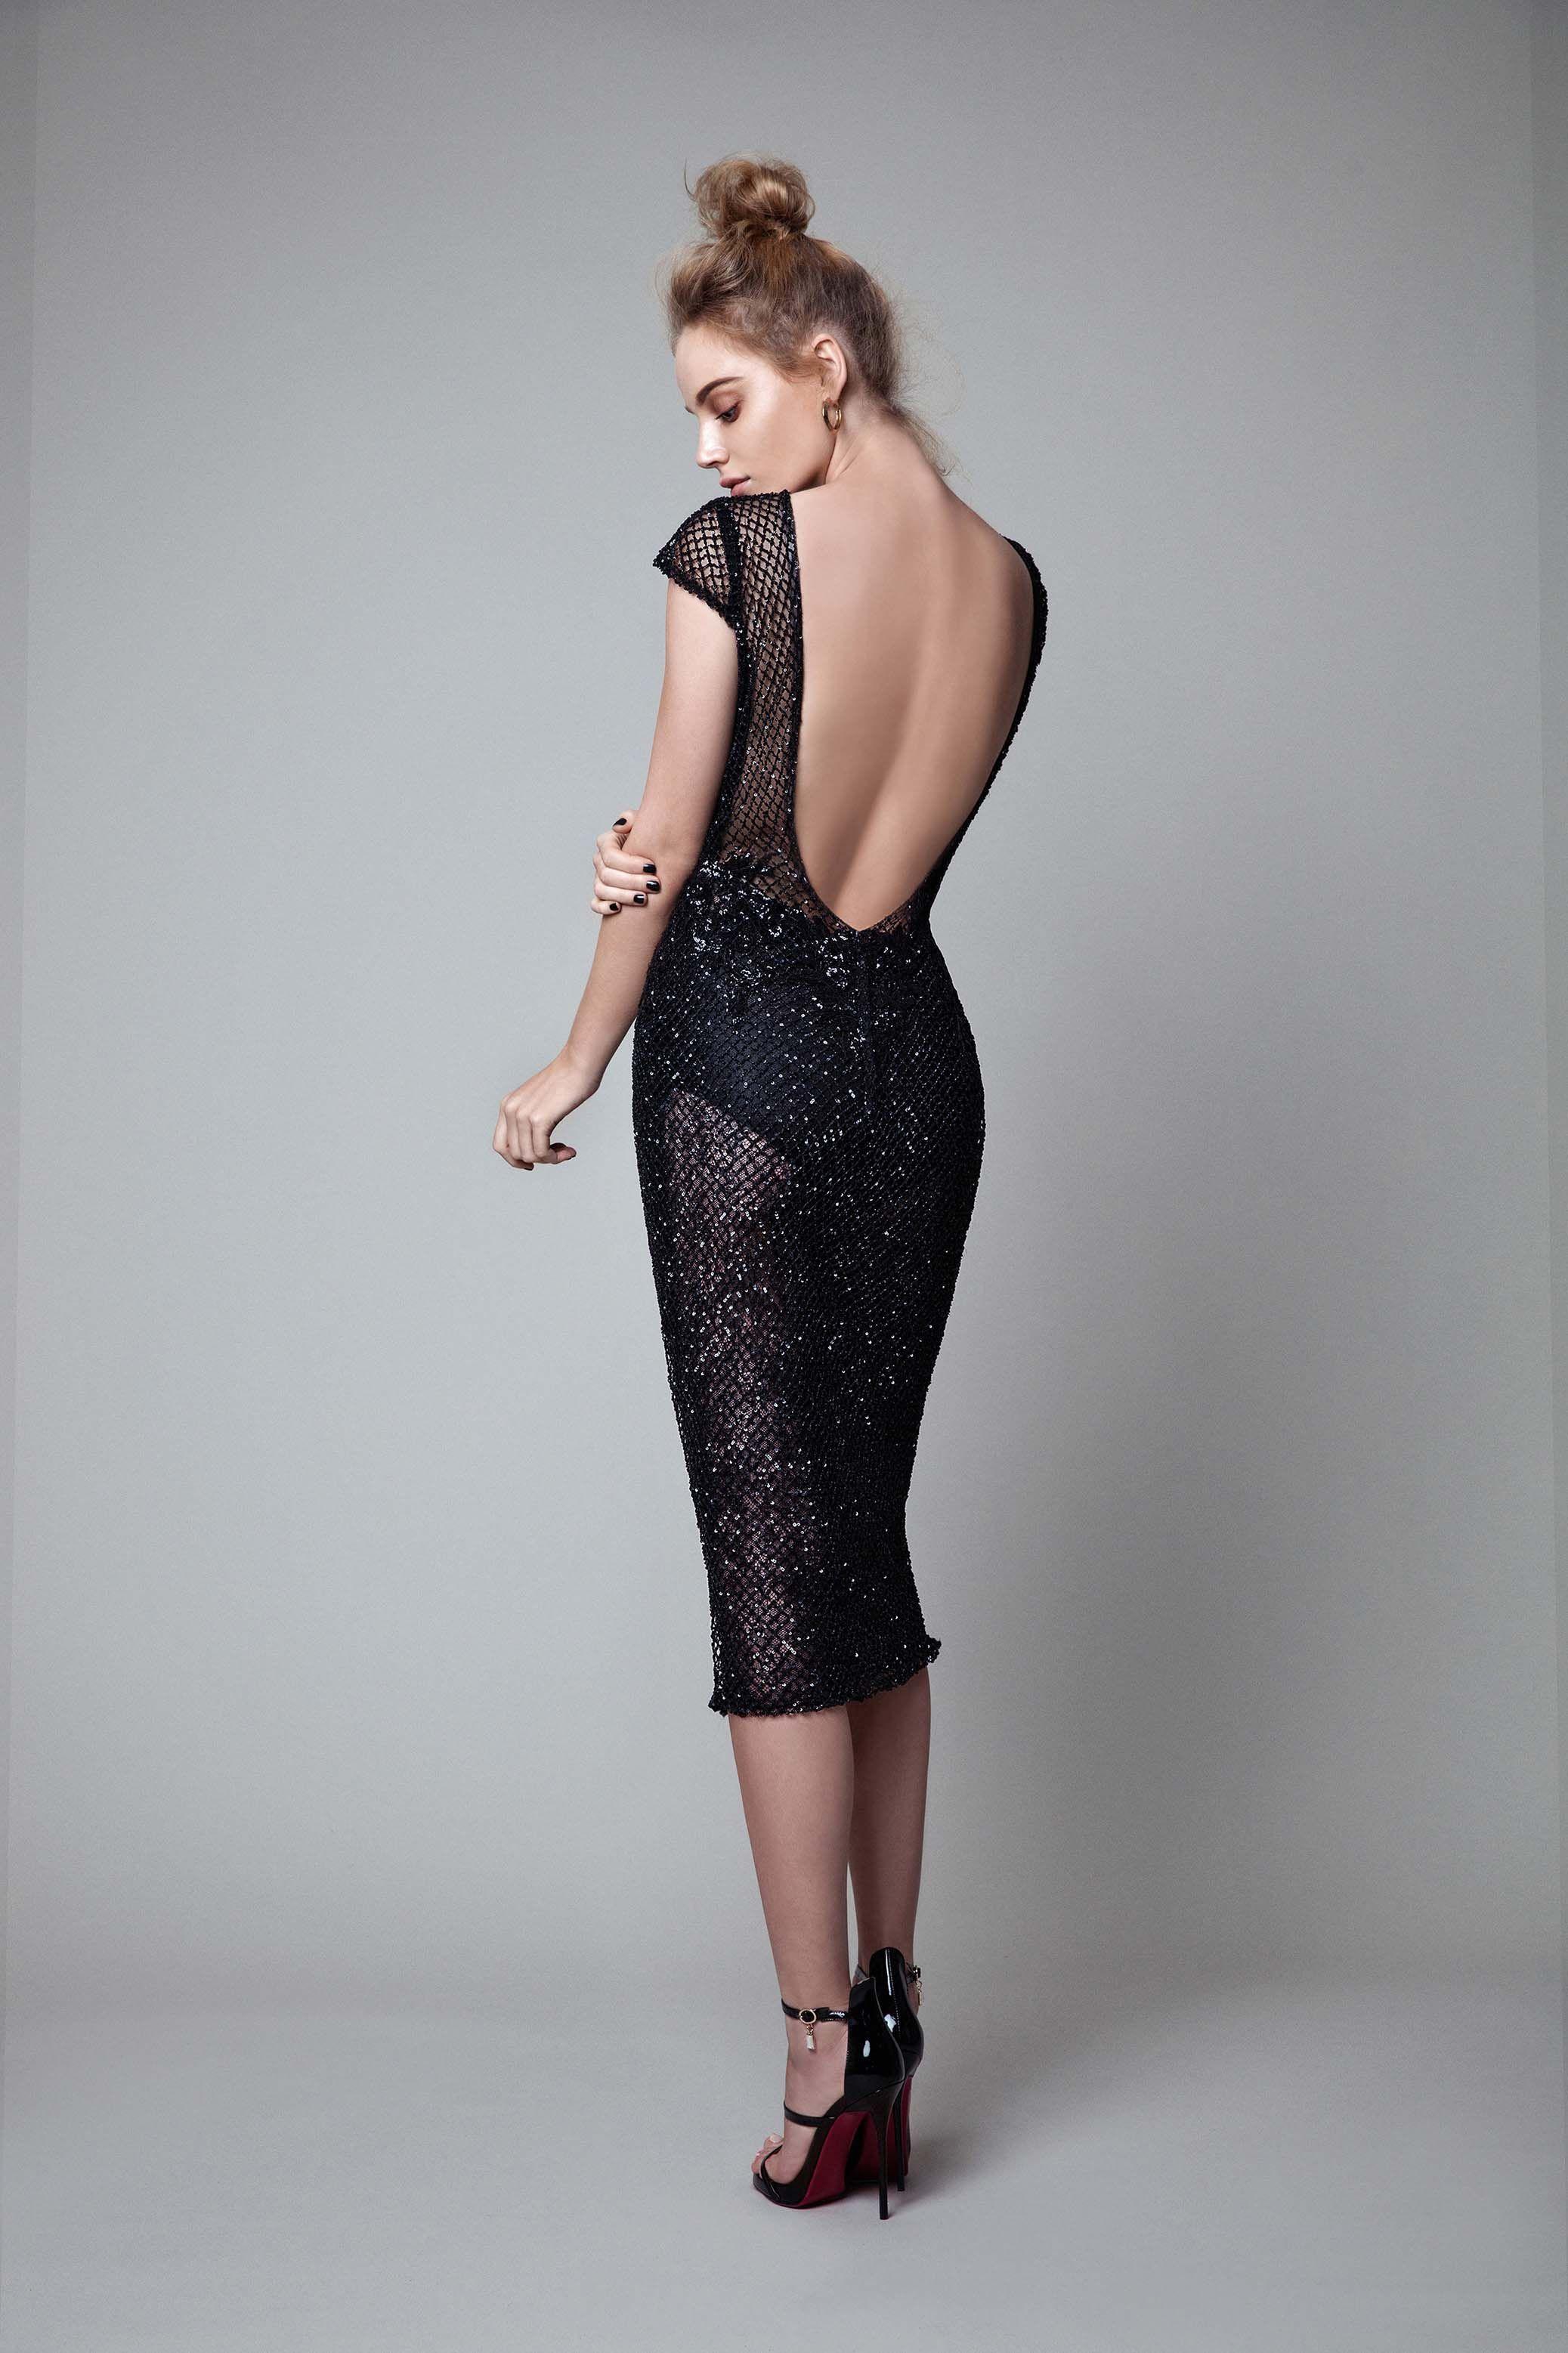 Karen fw berta nami pinterest prom heels gowns